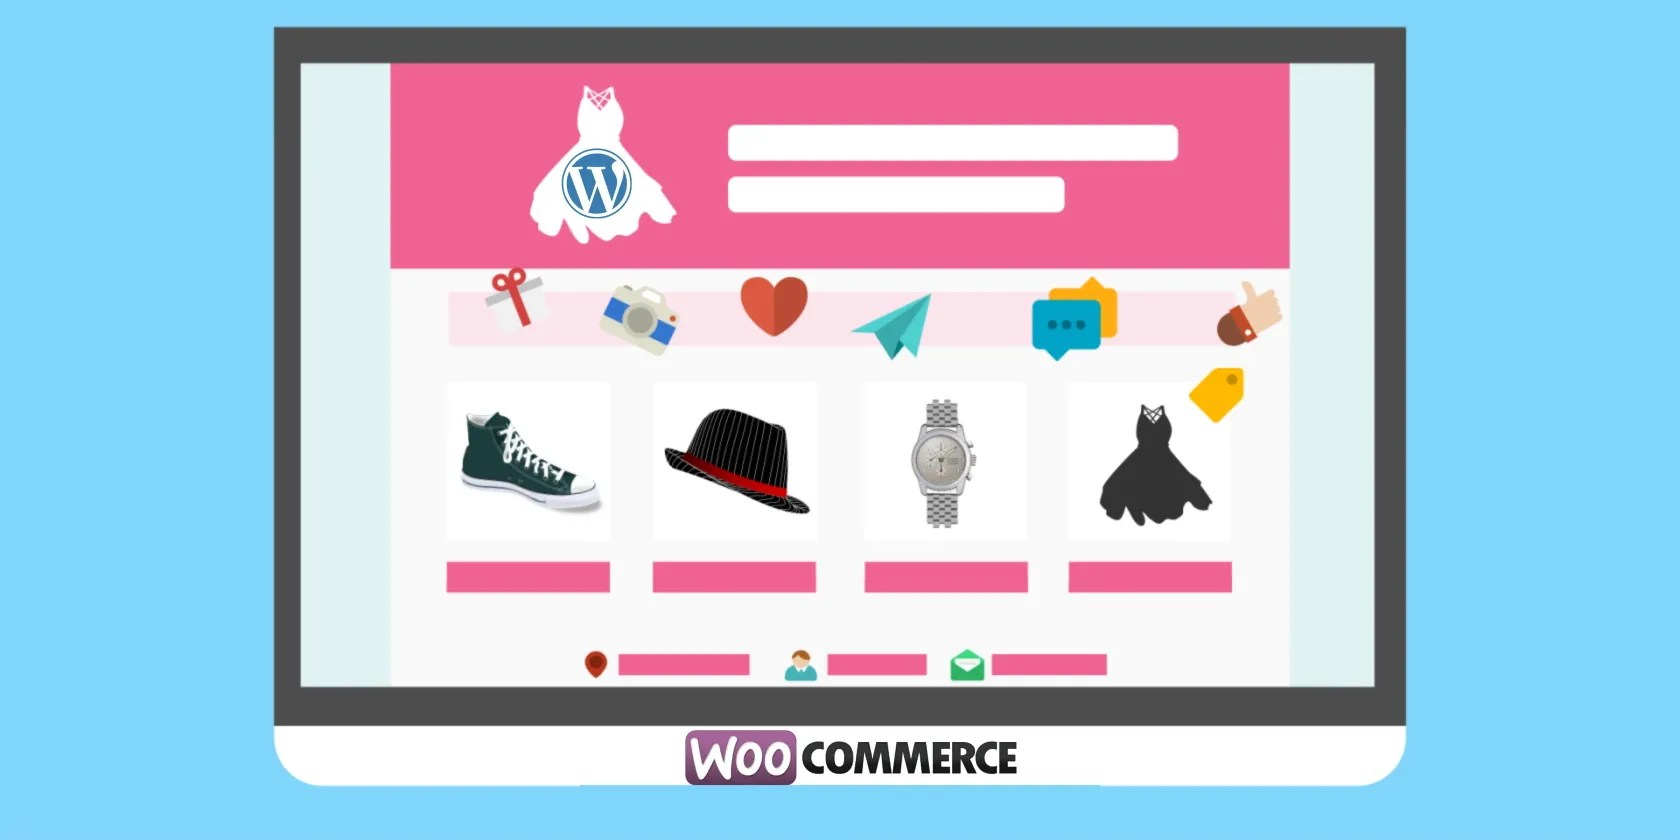 6 WooCommerce Alternatives For WordPress - MakeUseOf